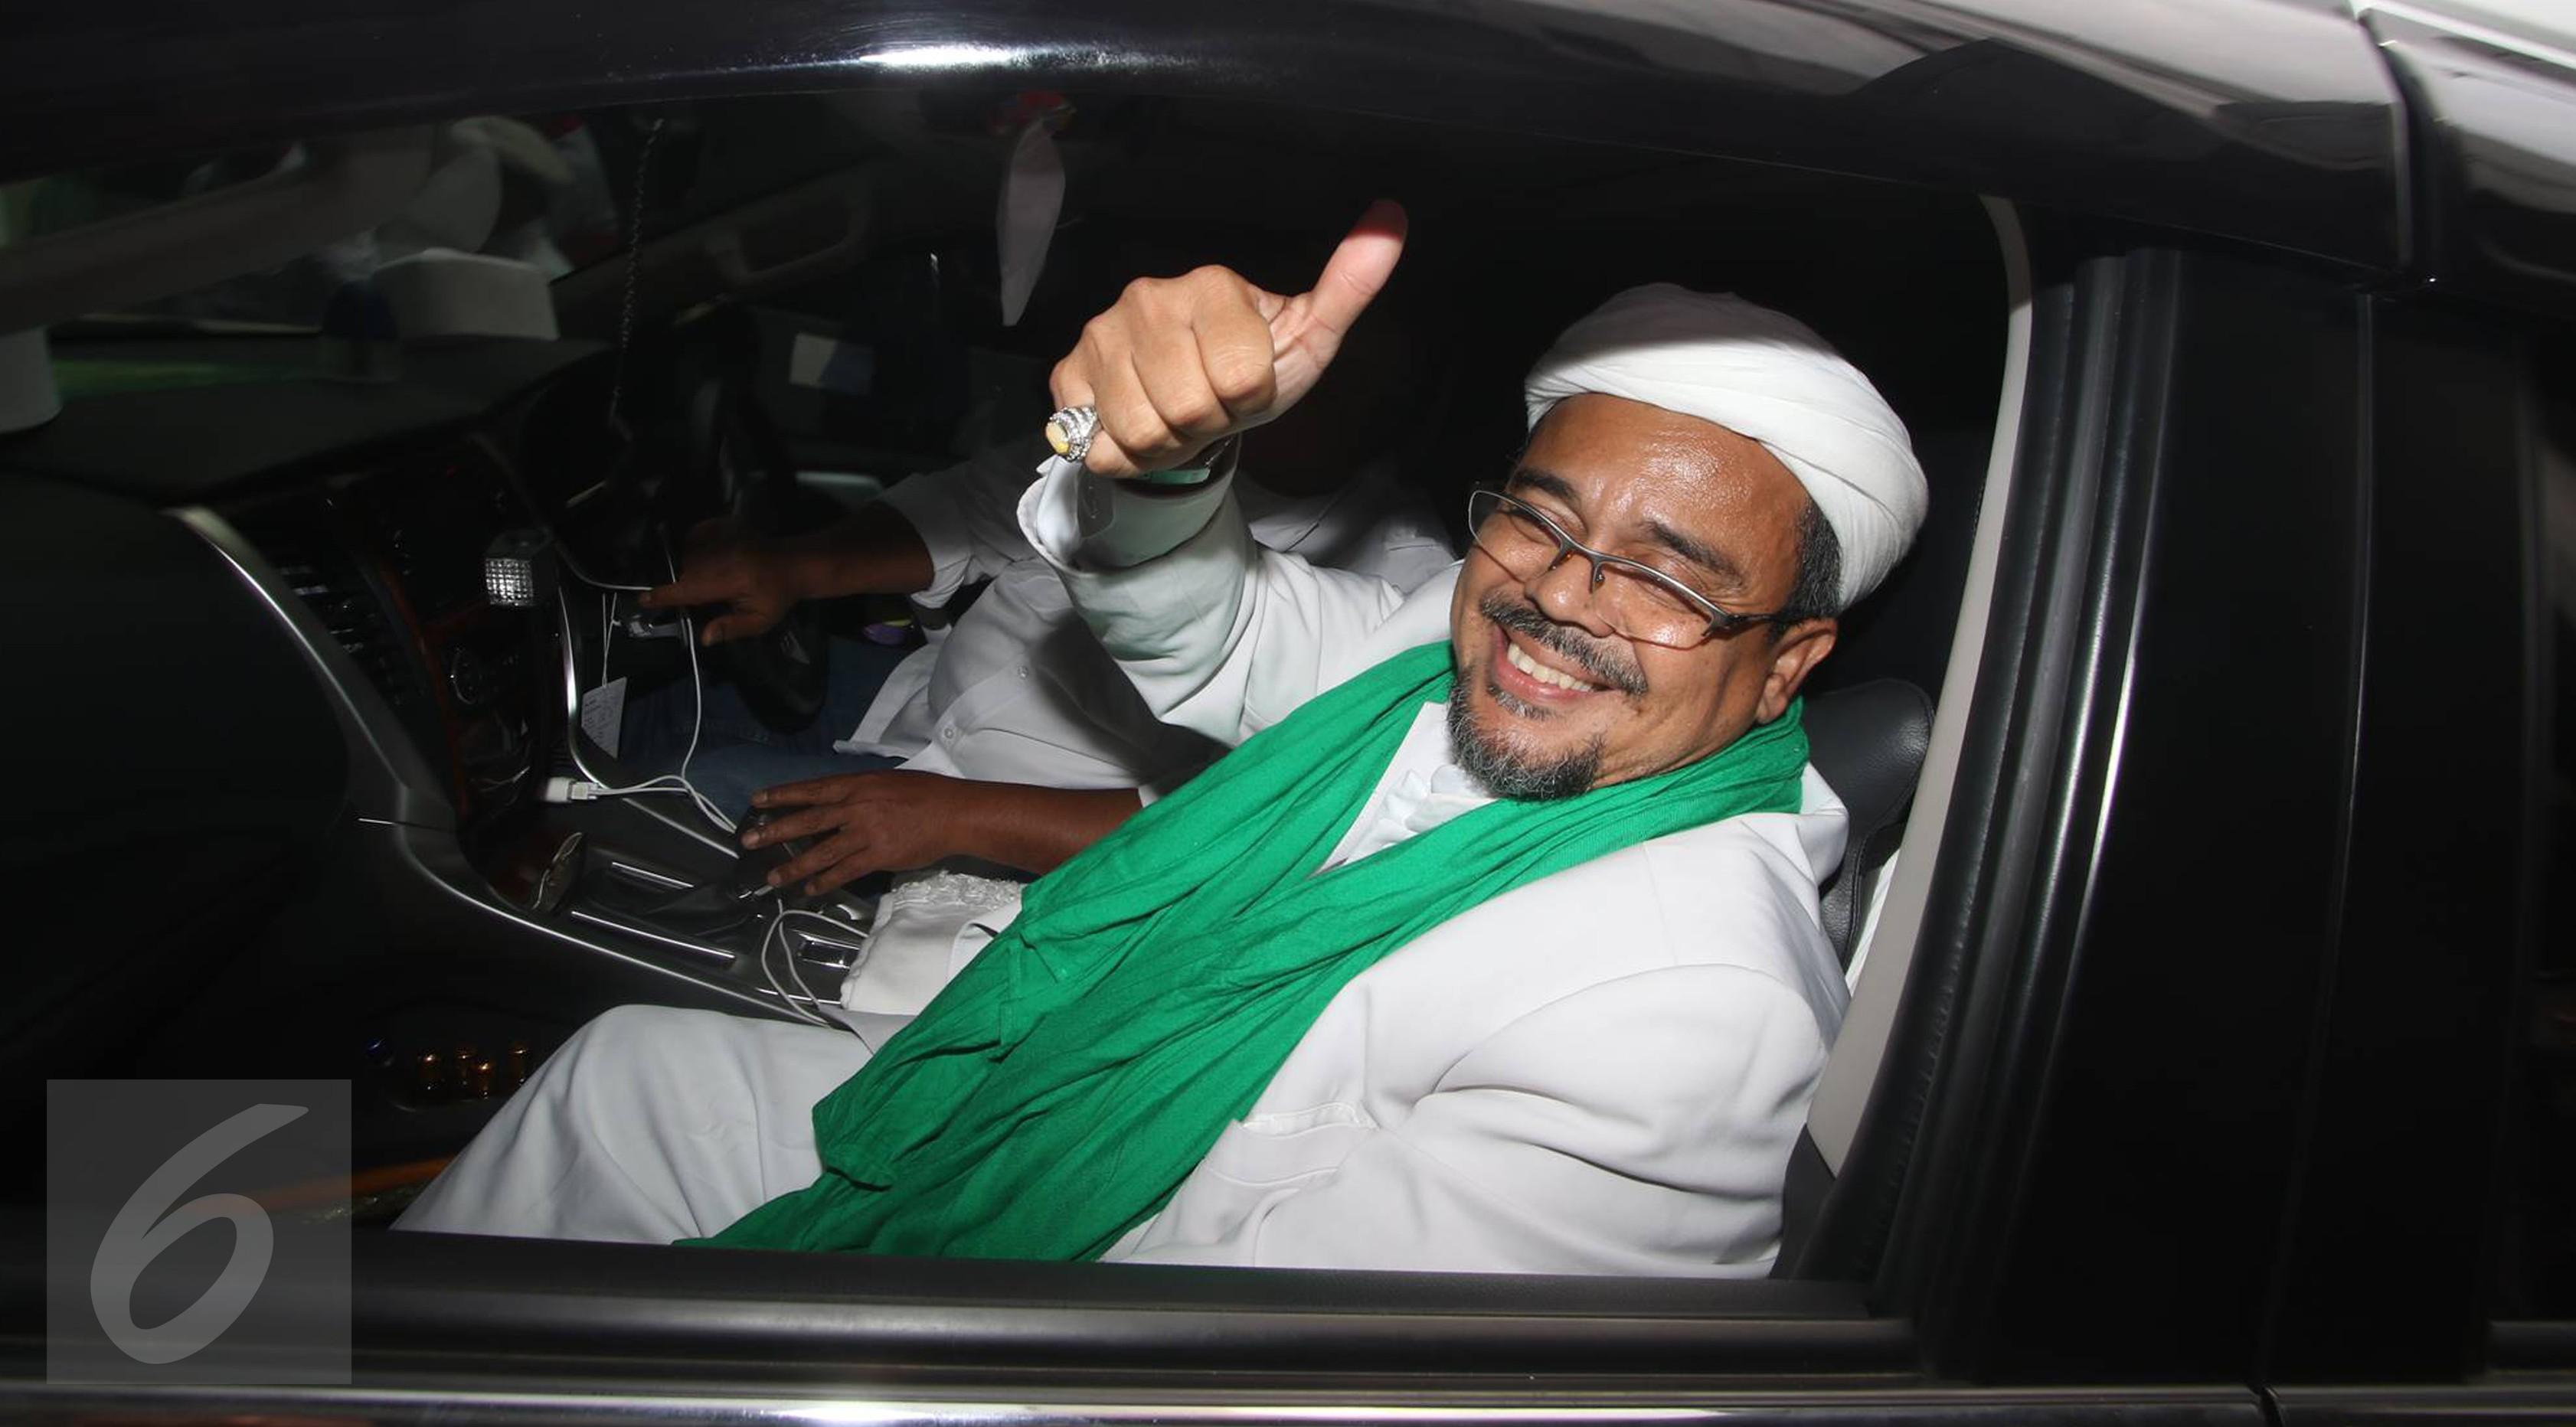 Pimpinan FPI, Muhammad Rizieq Shihab menyapa awak media usai menjalani pemeriksaan di Bareskrim, Jakarta, Rabu (23/11). Rizieq diperiksa sebagai saksi ahli dalam kasus penistaan agama yang diduga dilakukan Ahok. (Liputan6.com/Immanuel Antonius)